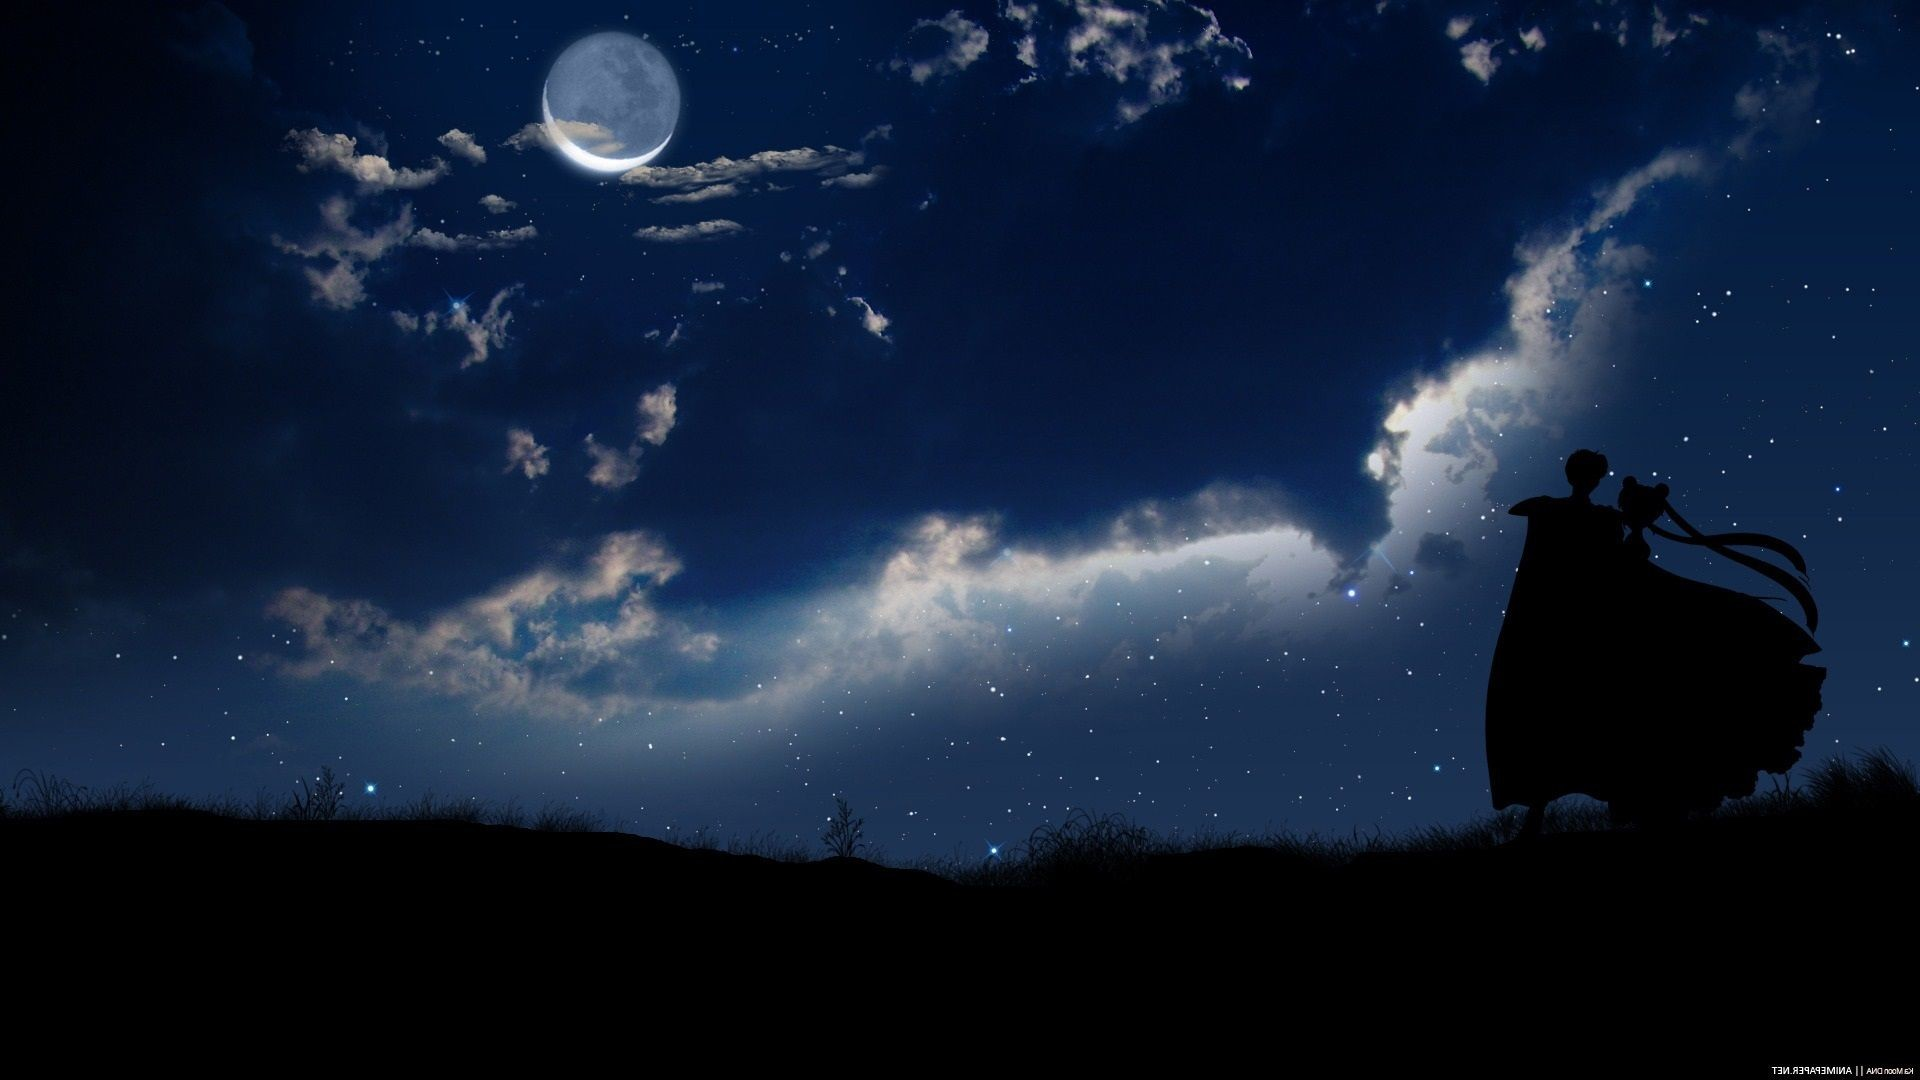 sailor-moon-backgrounds